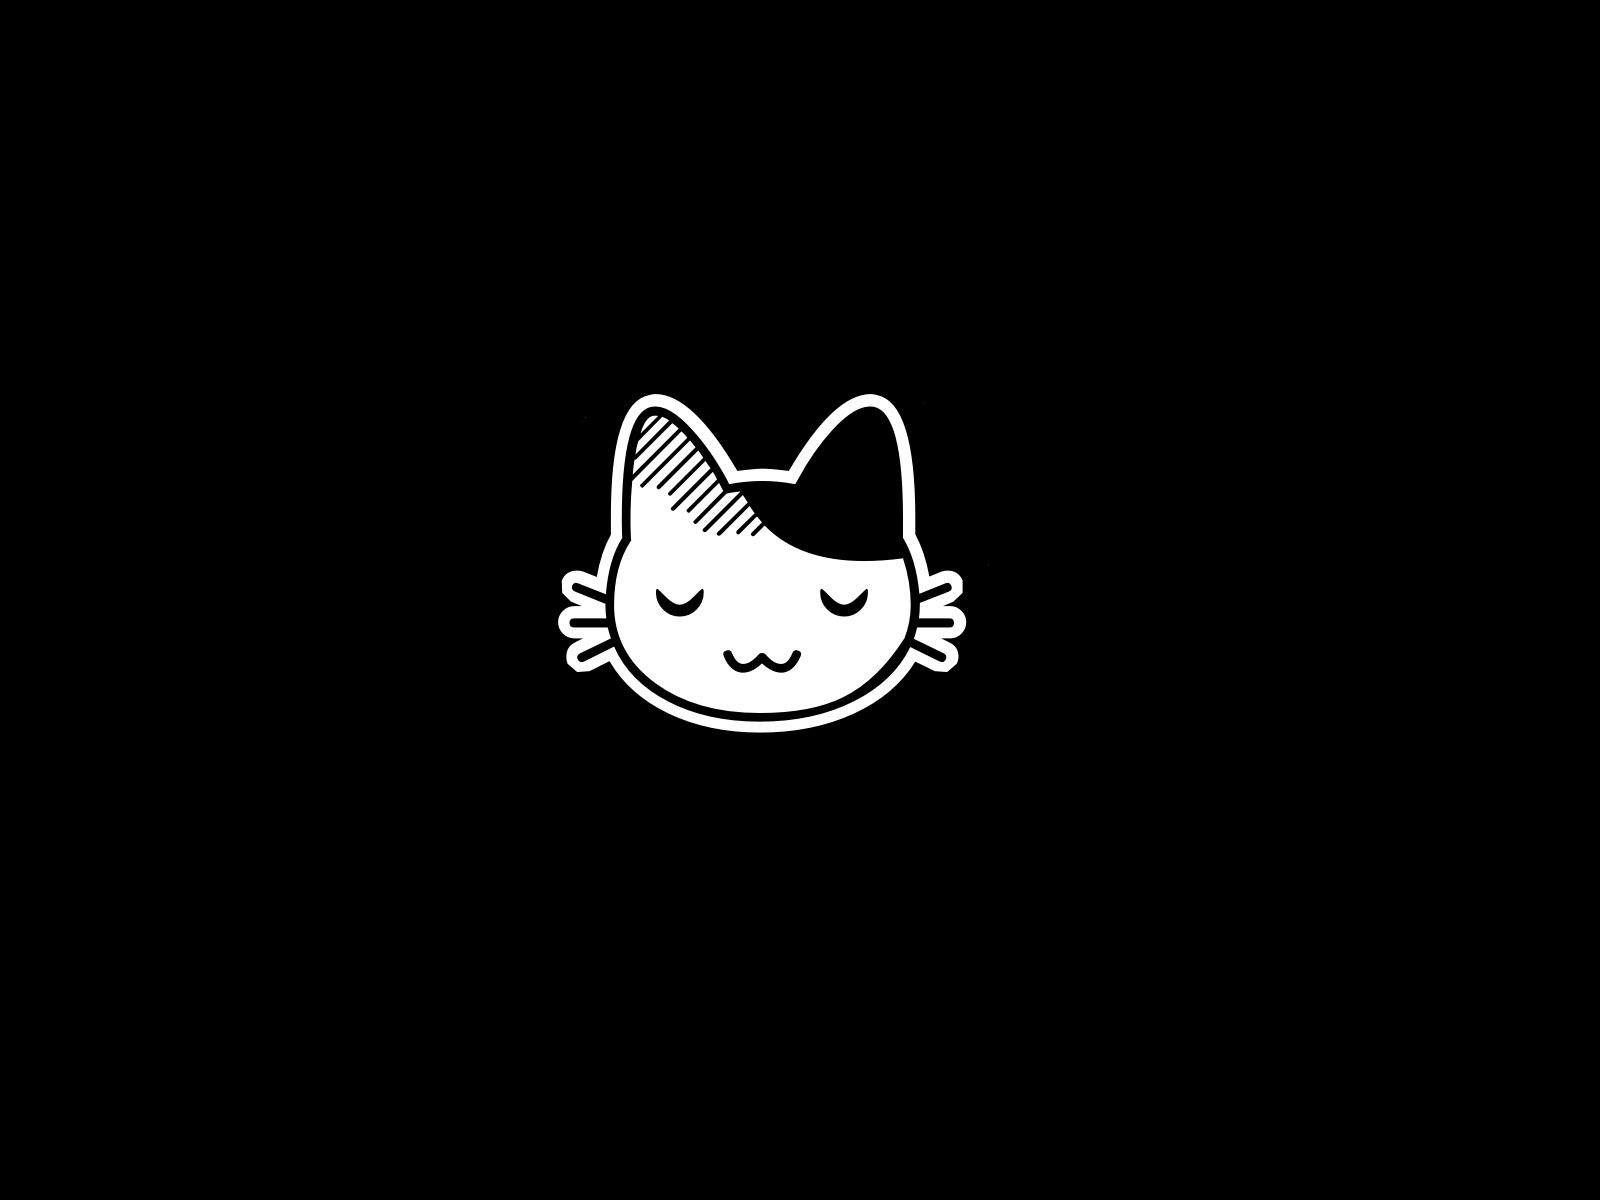 Anime Cat Hd Background Cartoon Wallpaper Black And White Cartoon Cute Anime Cat